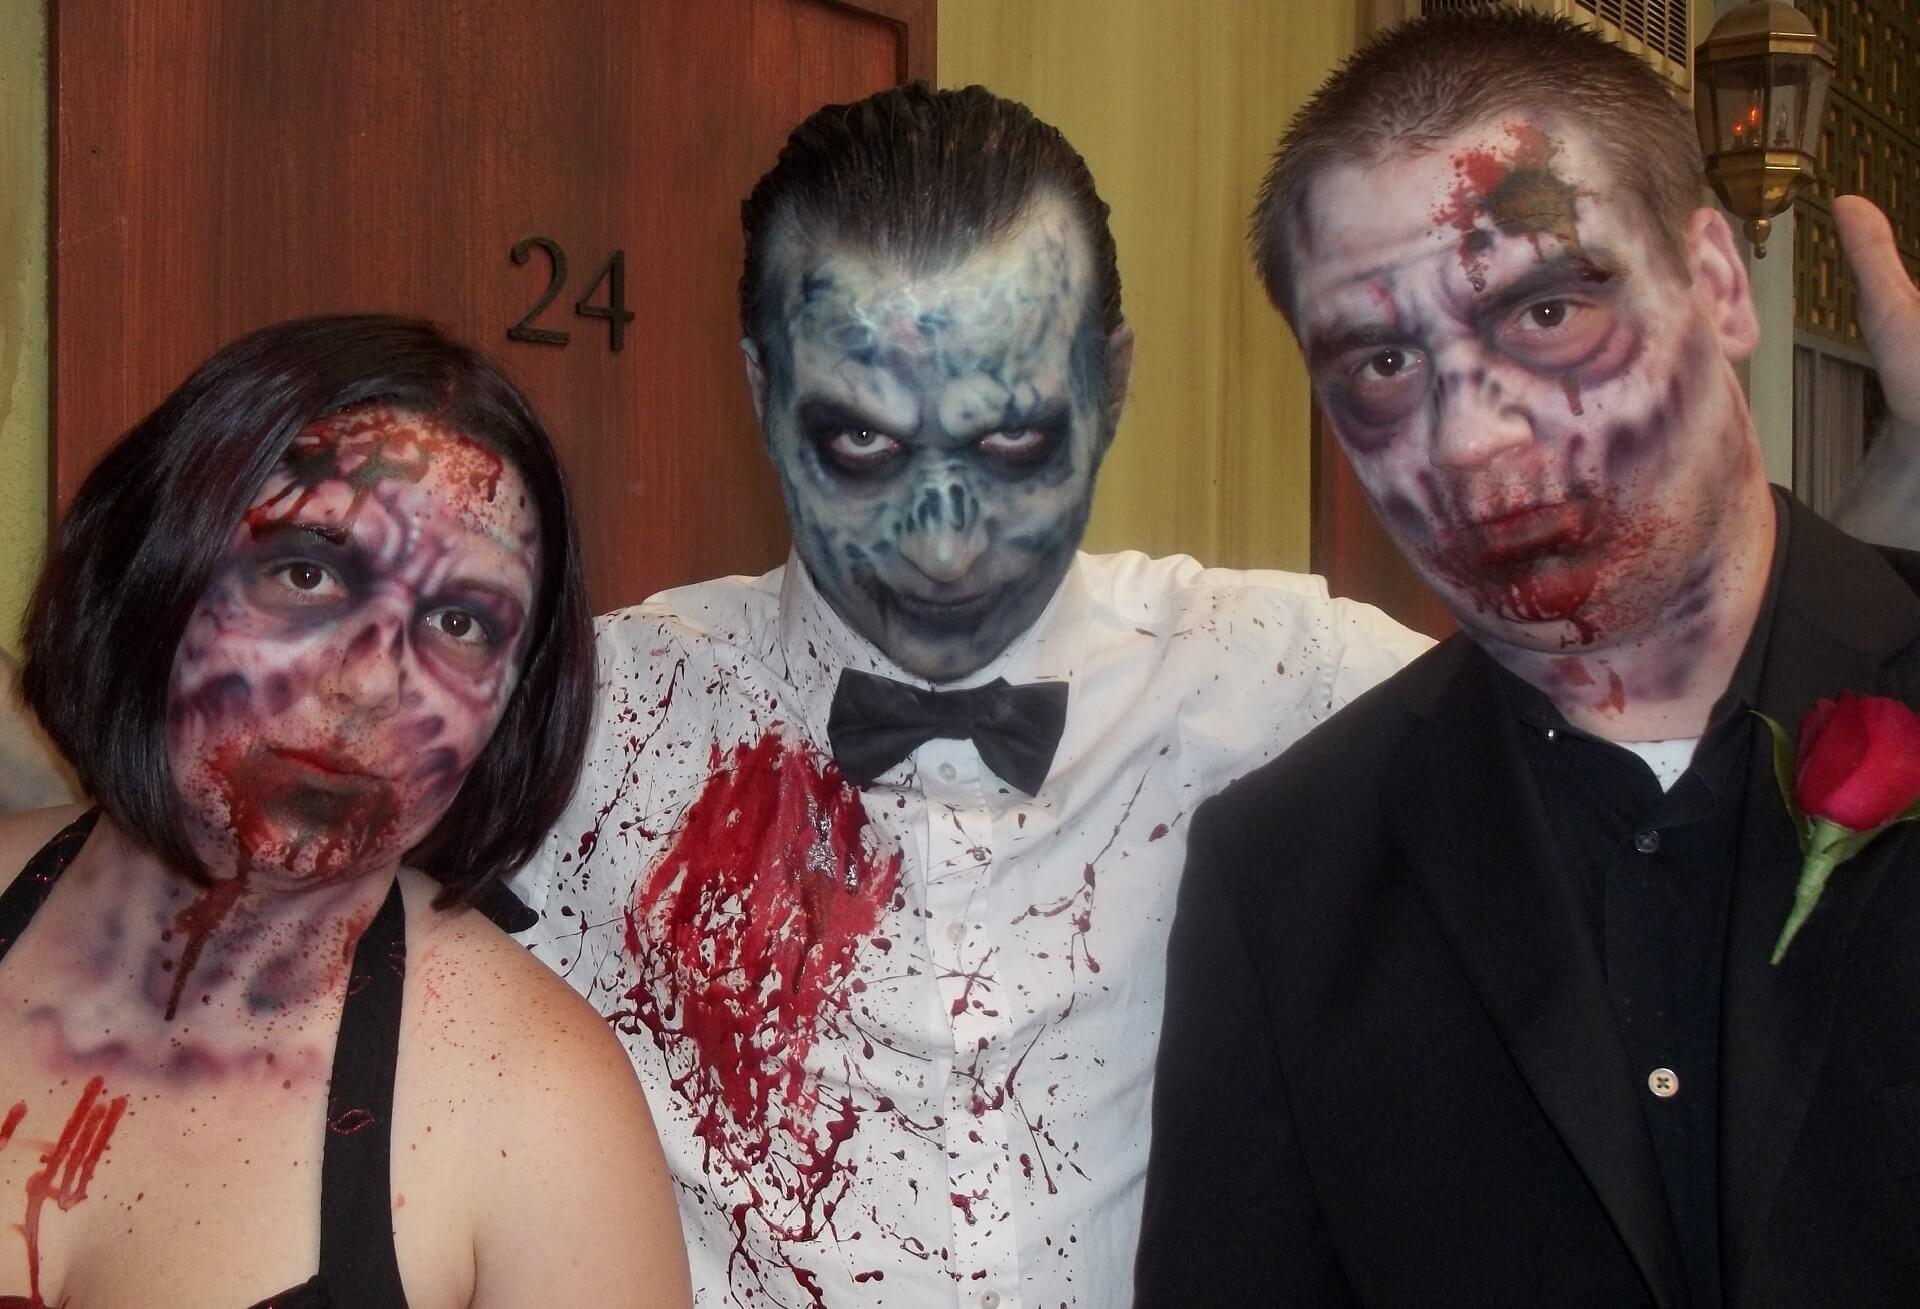 Halloween Ghoulish Photo Tour